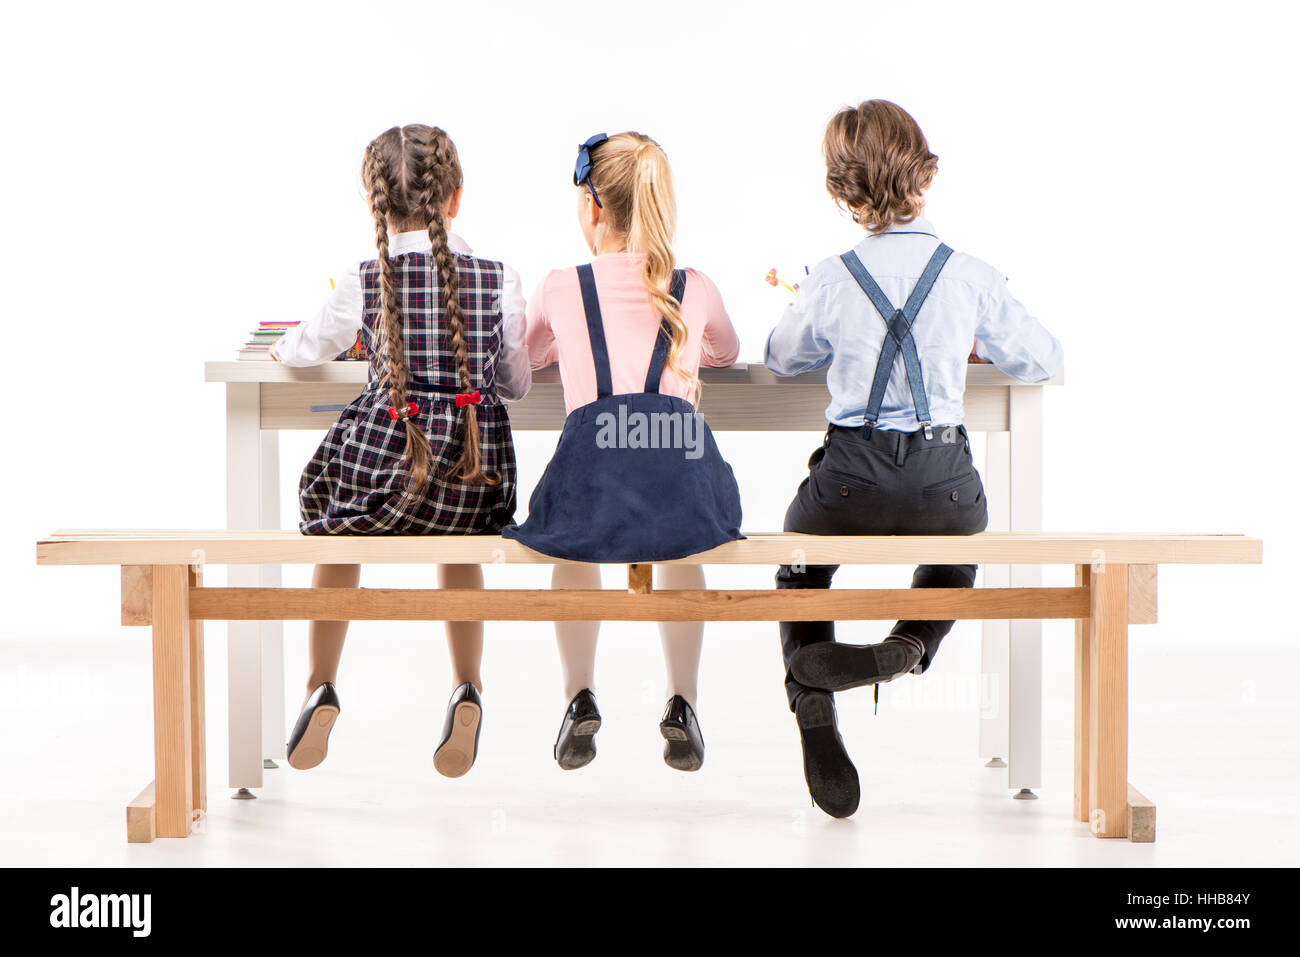 Back view of schoolchildren studying at desk on white - Stock Image